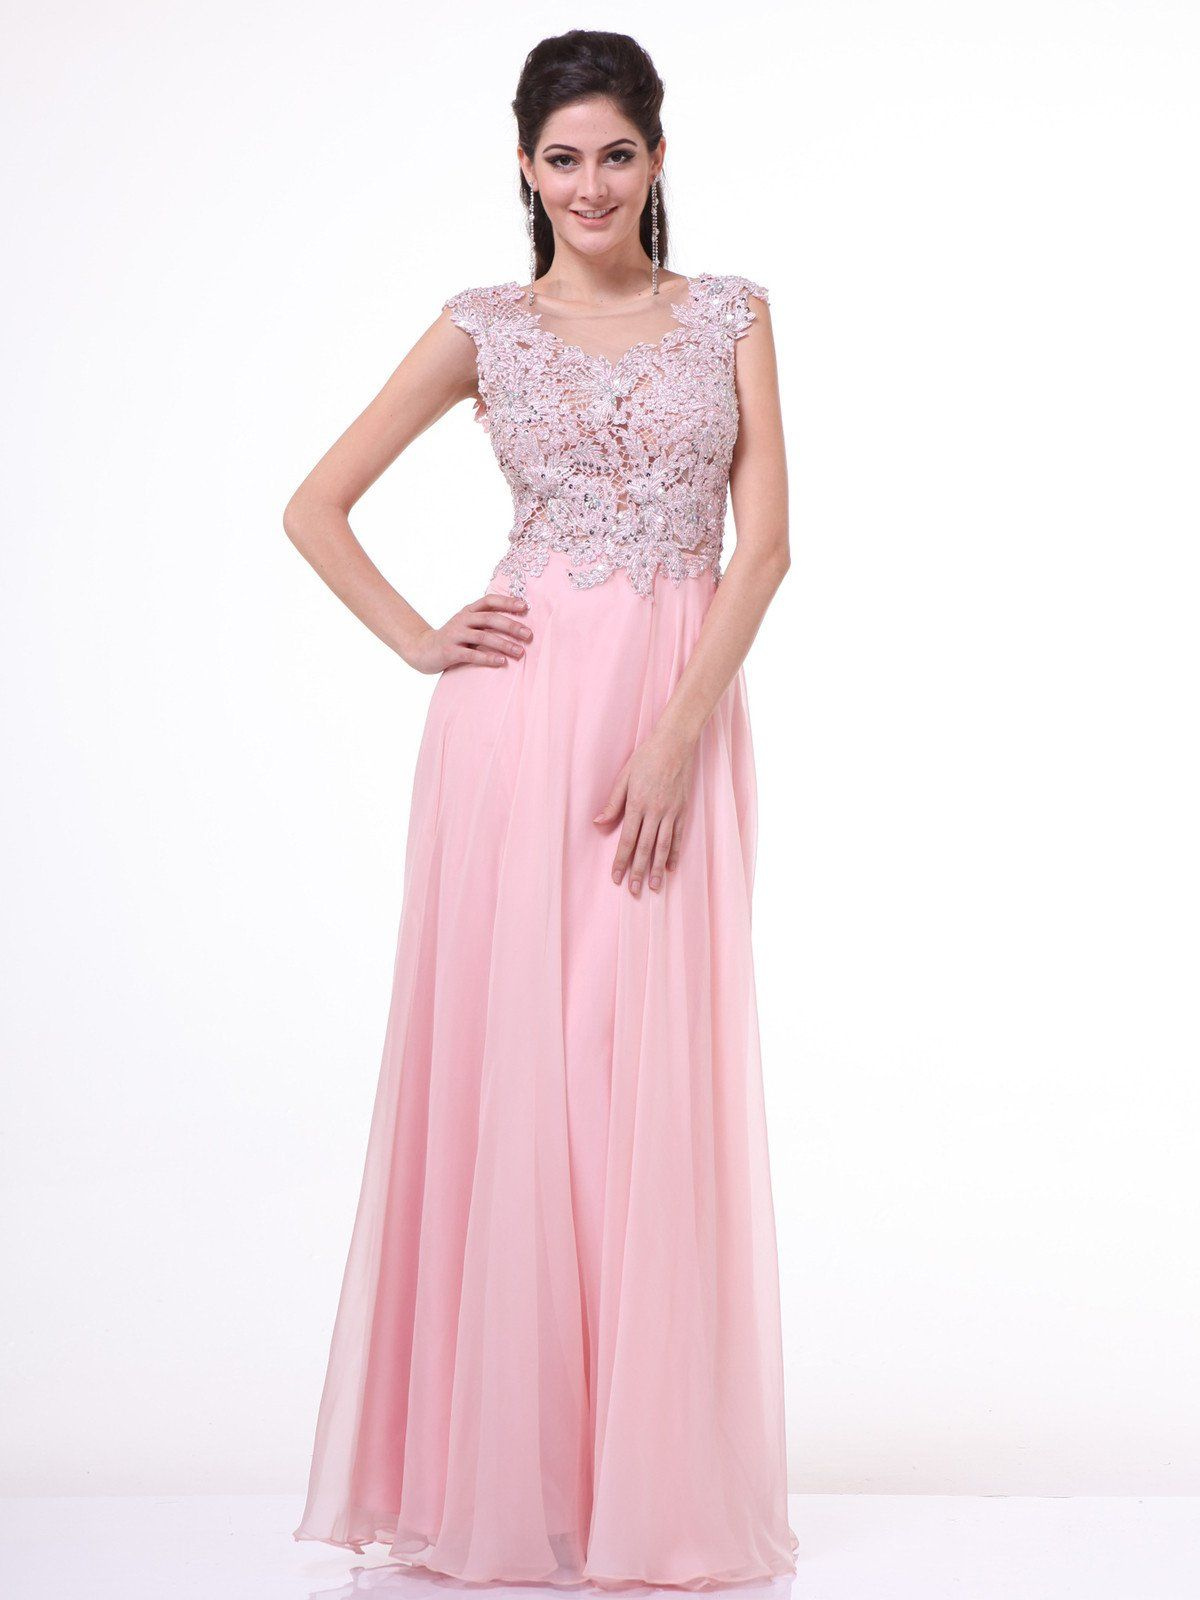 Embellished Illusion Evening Dress by Cinderella Divine CJ1022